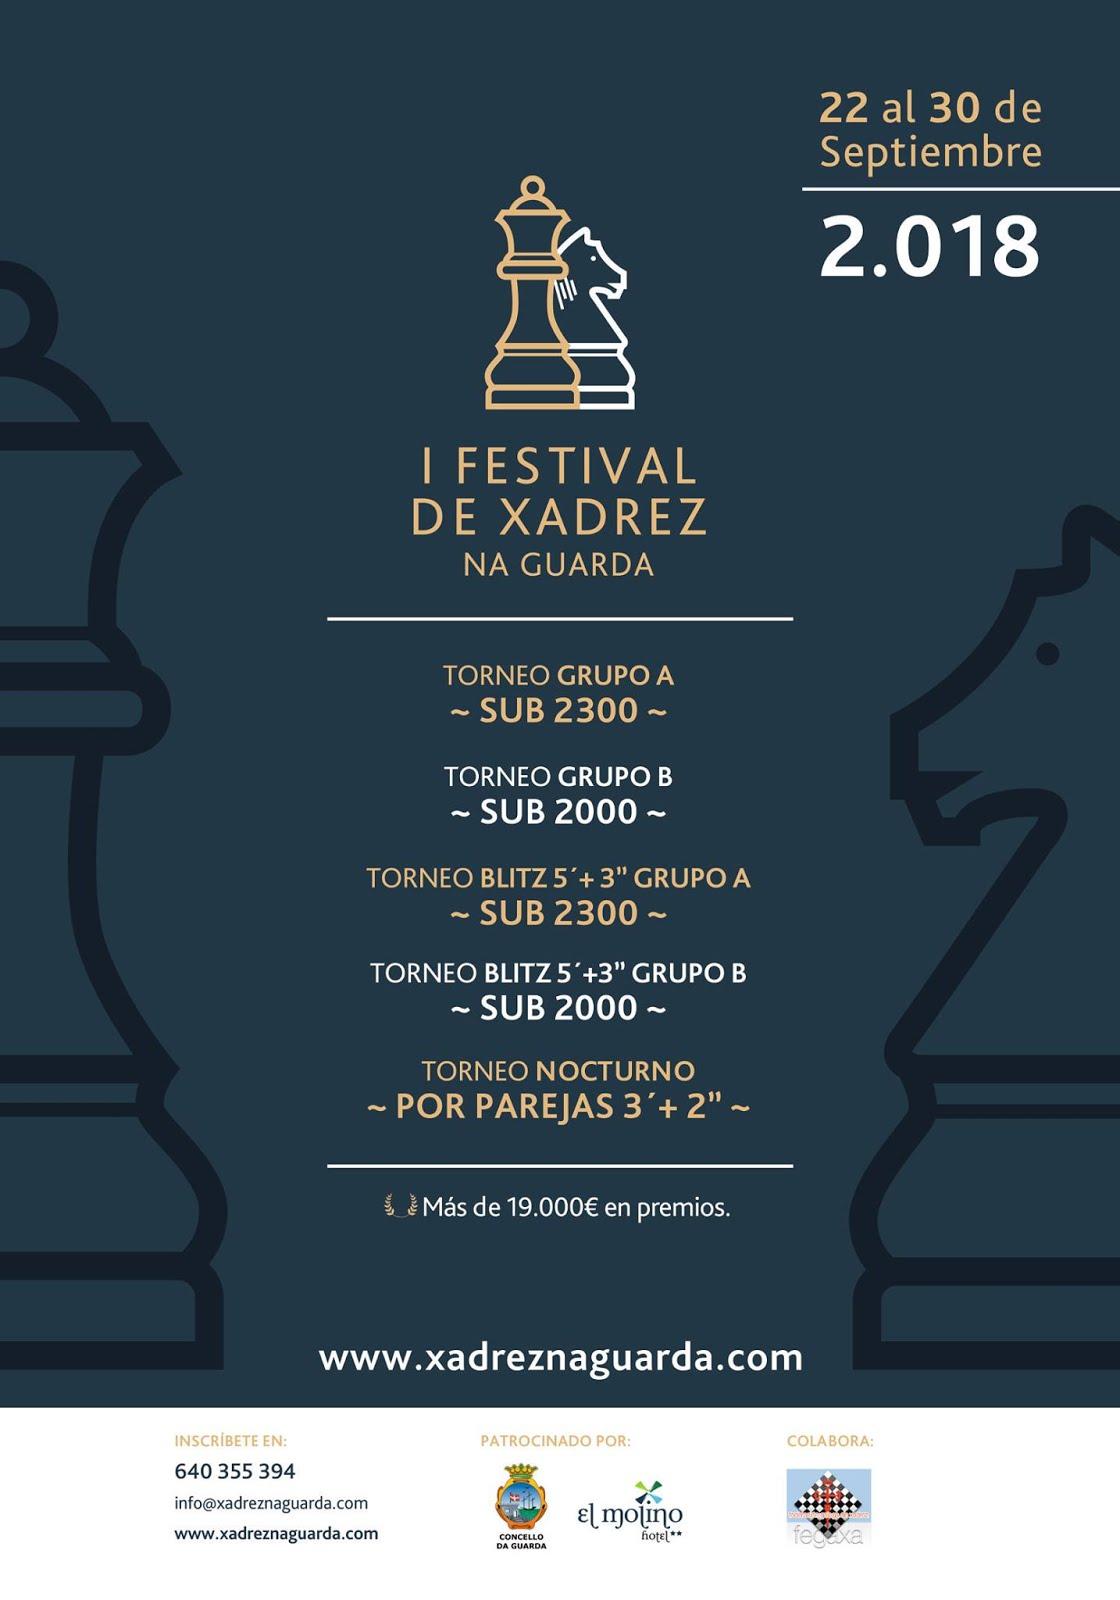 I Festival de xadrez Na Guarda